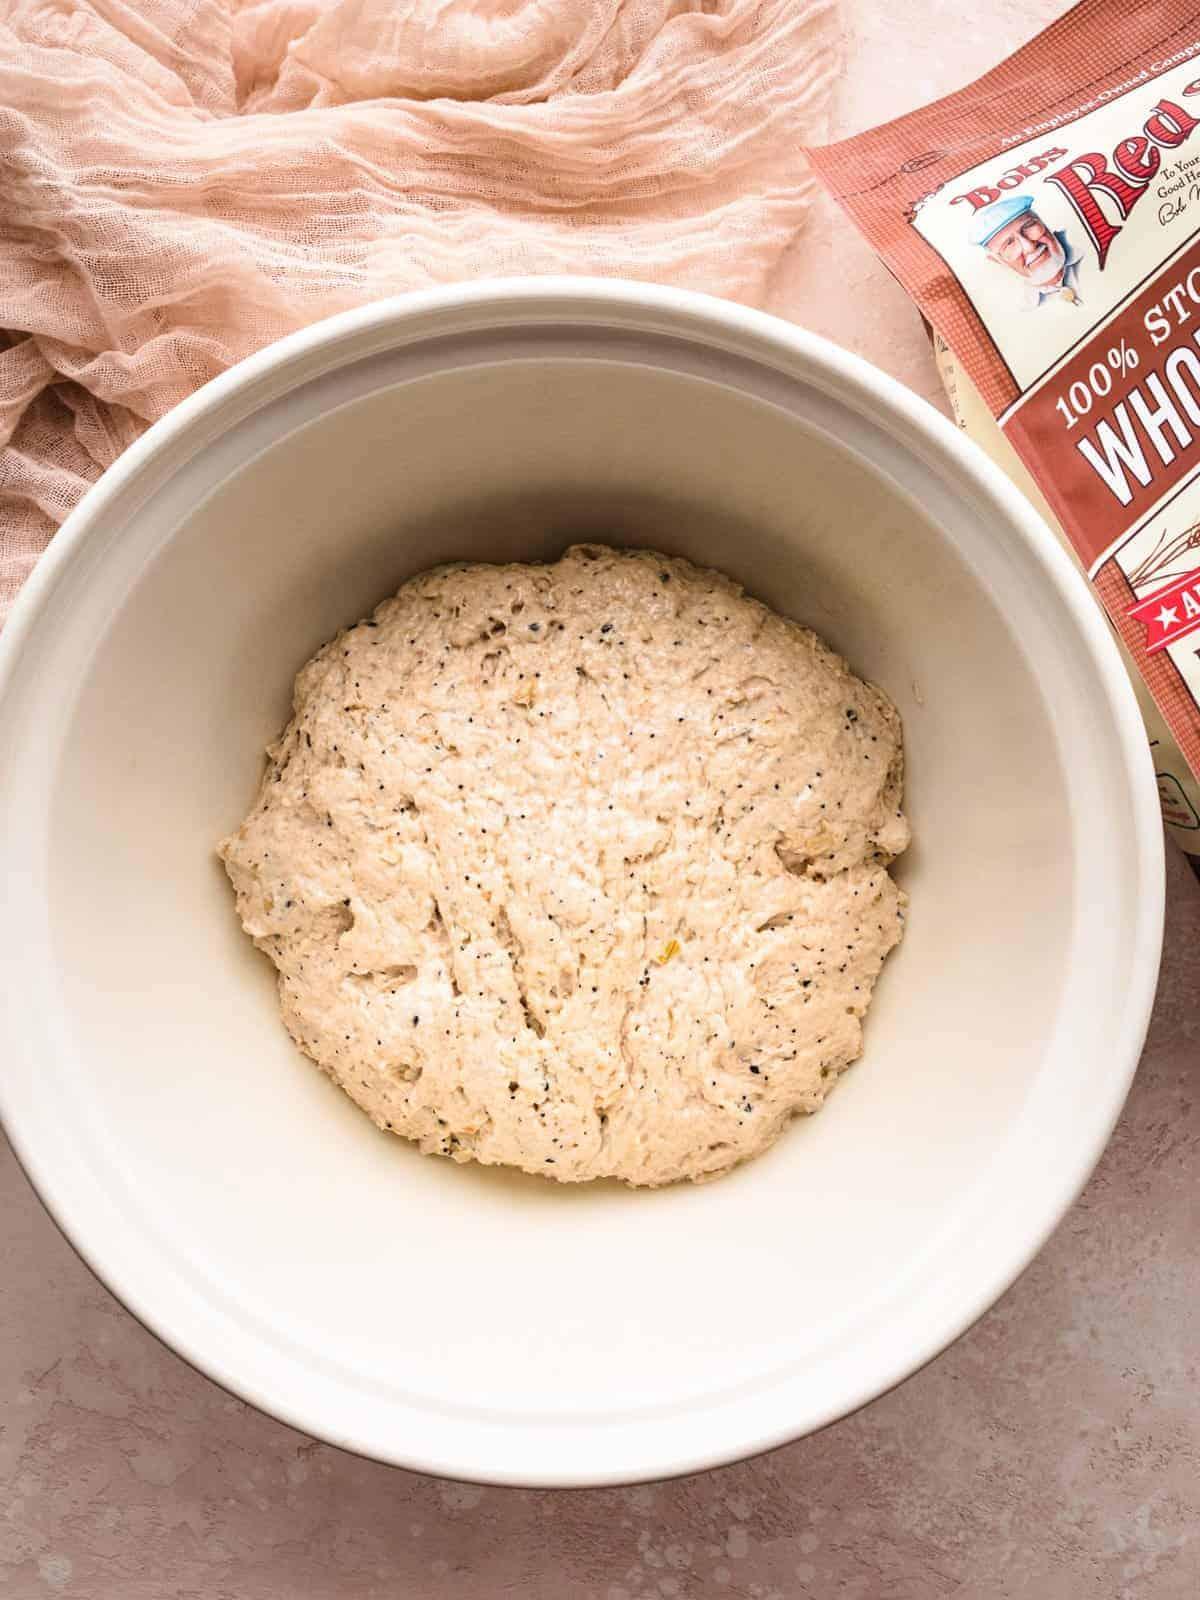 no knead whole wheat bread step 1